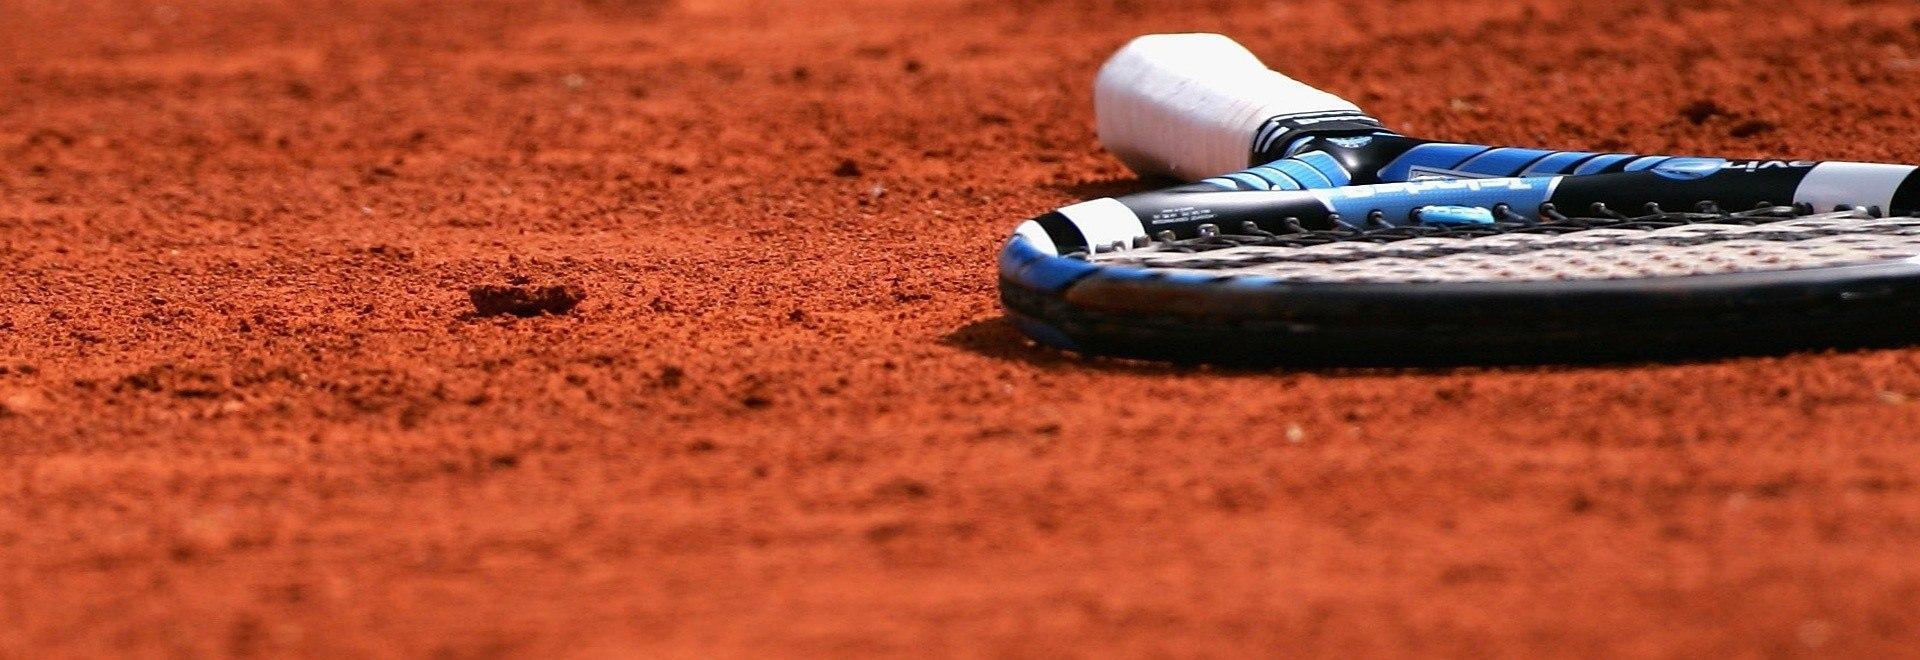 ATP World Tour Masters 1000 HL 2010 - Stag. 2010 - ATP Finals Londra